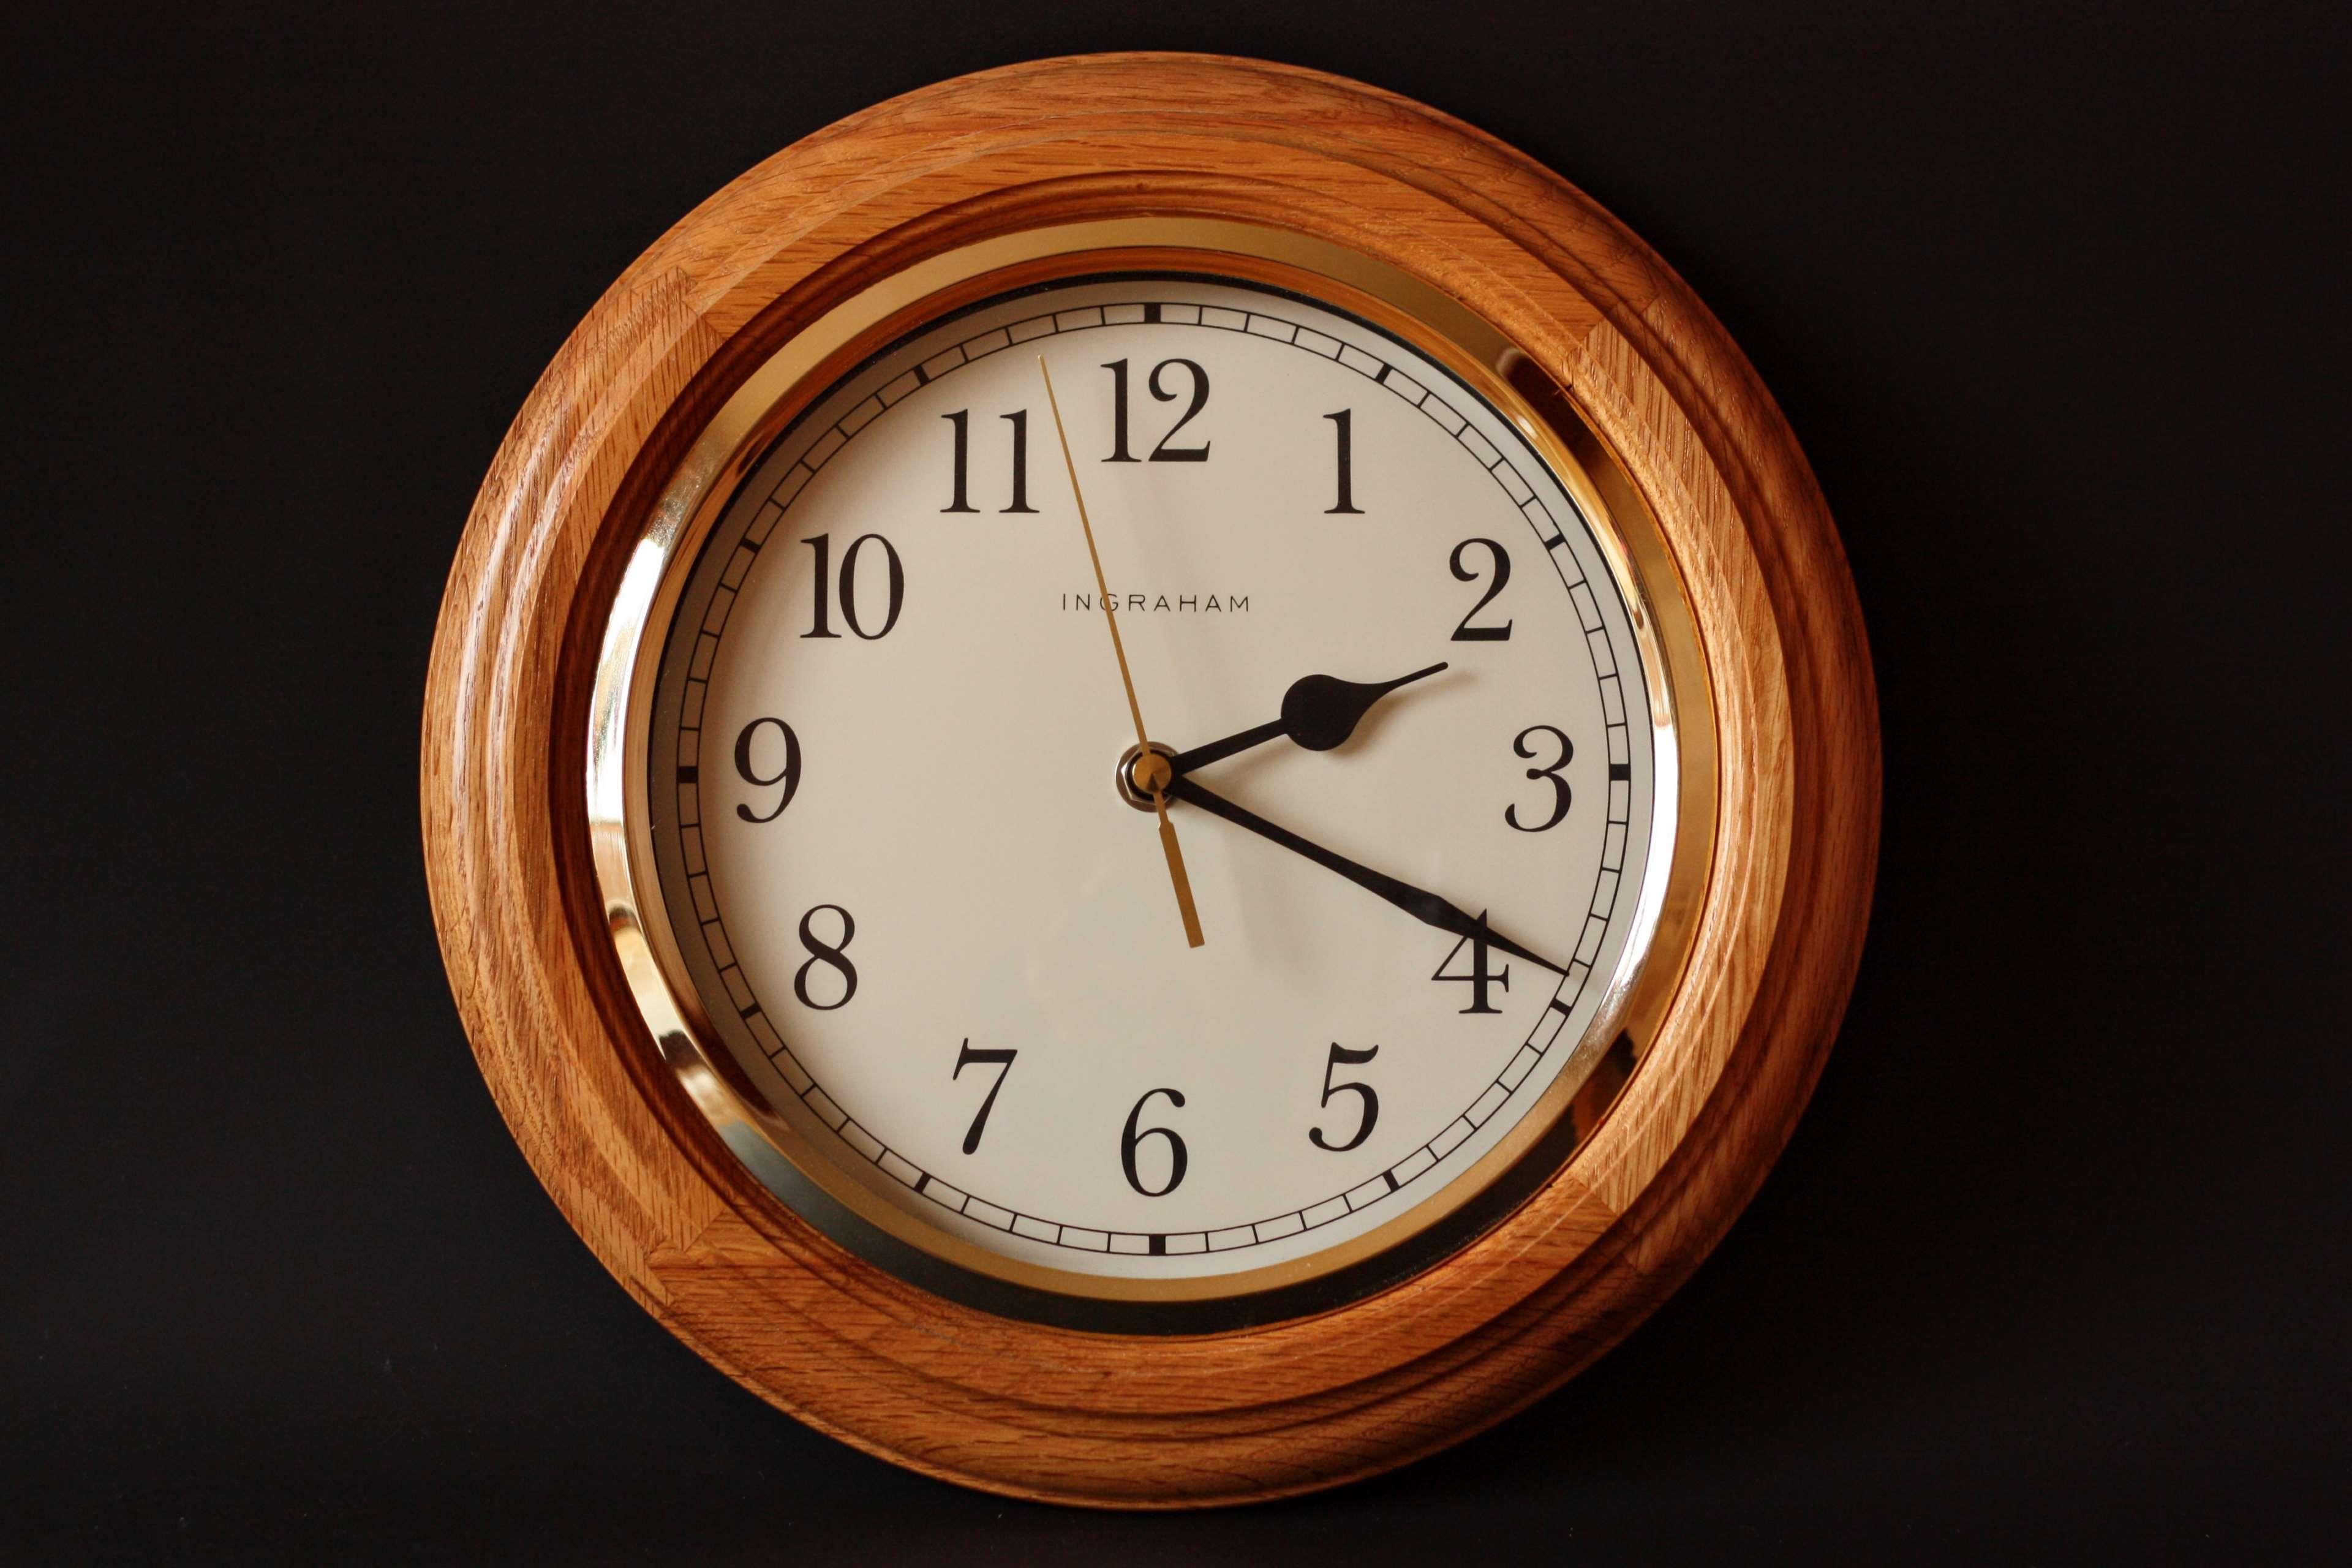 Alarm Clock Classic Clock Dial Gold Ingraham Late Minute Noon Number Precision Quartz Time Timer Wall Wall Clock Watch Wooden Clock Hd wallpaper alarm clock dial time